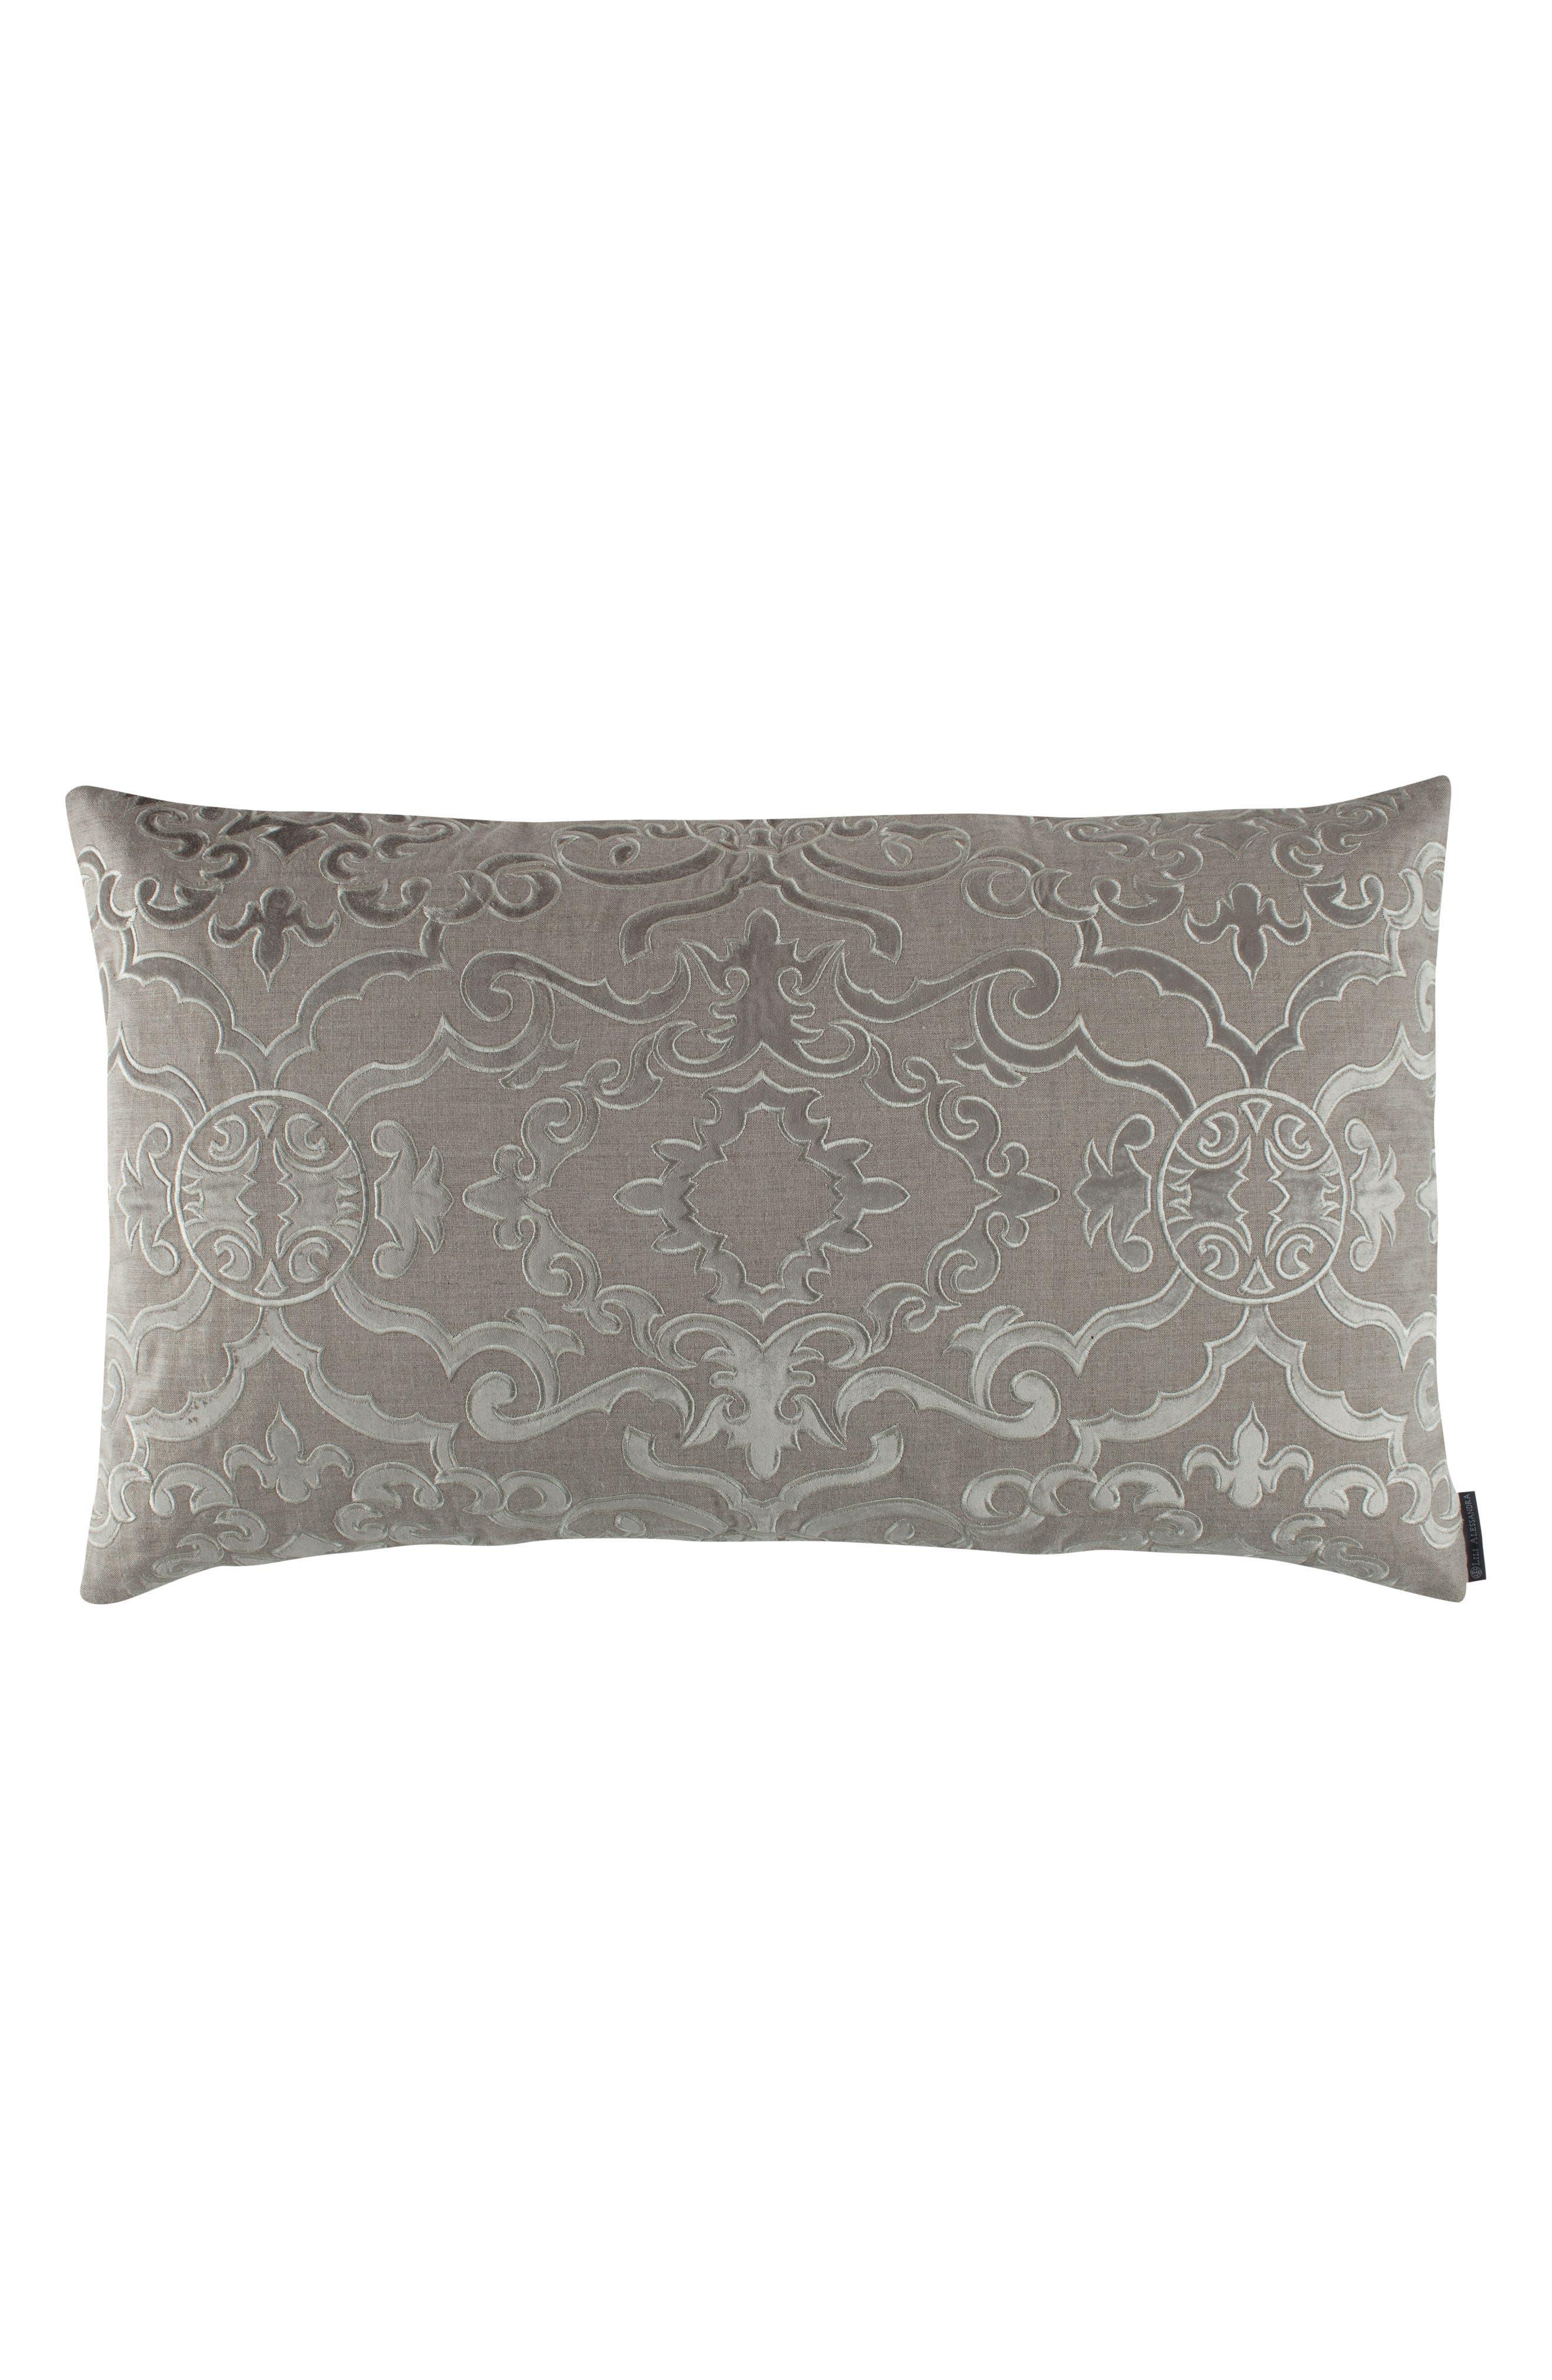 Valencia Accent Pillow,                         Main,                         color, STONE